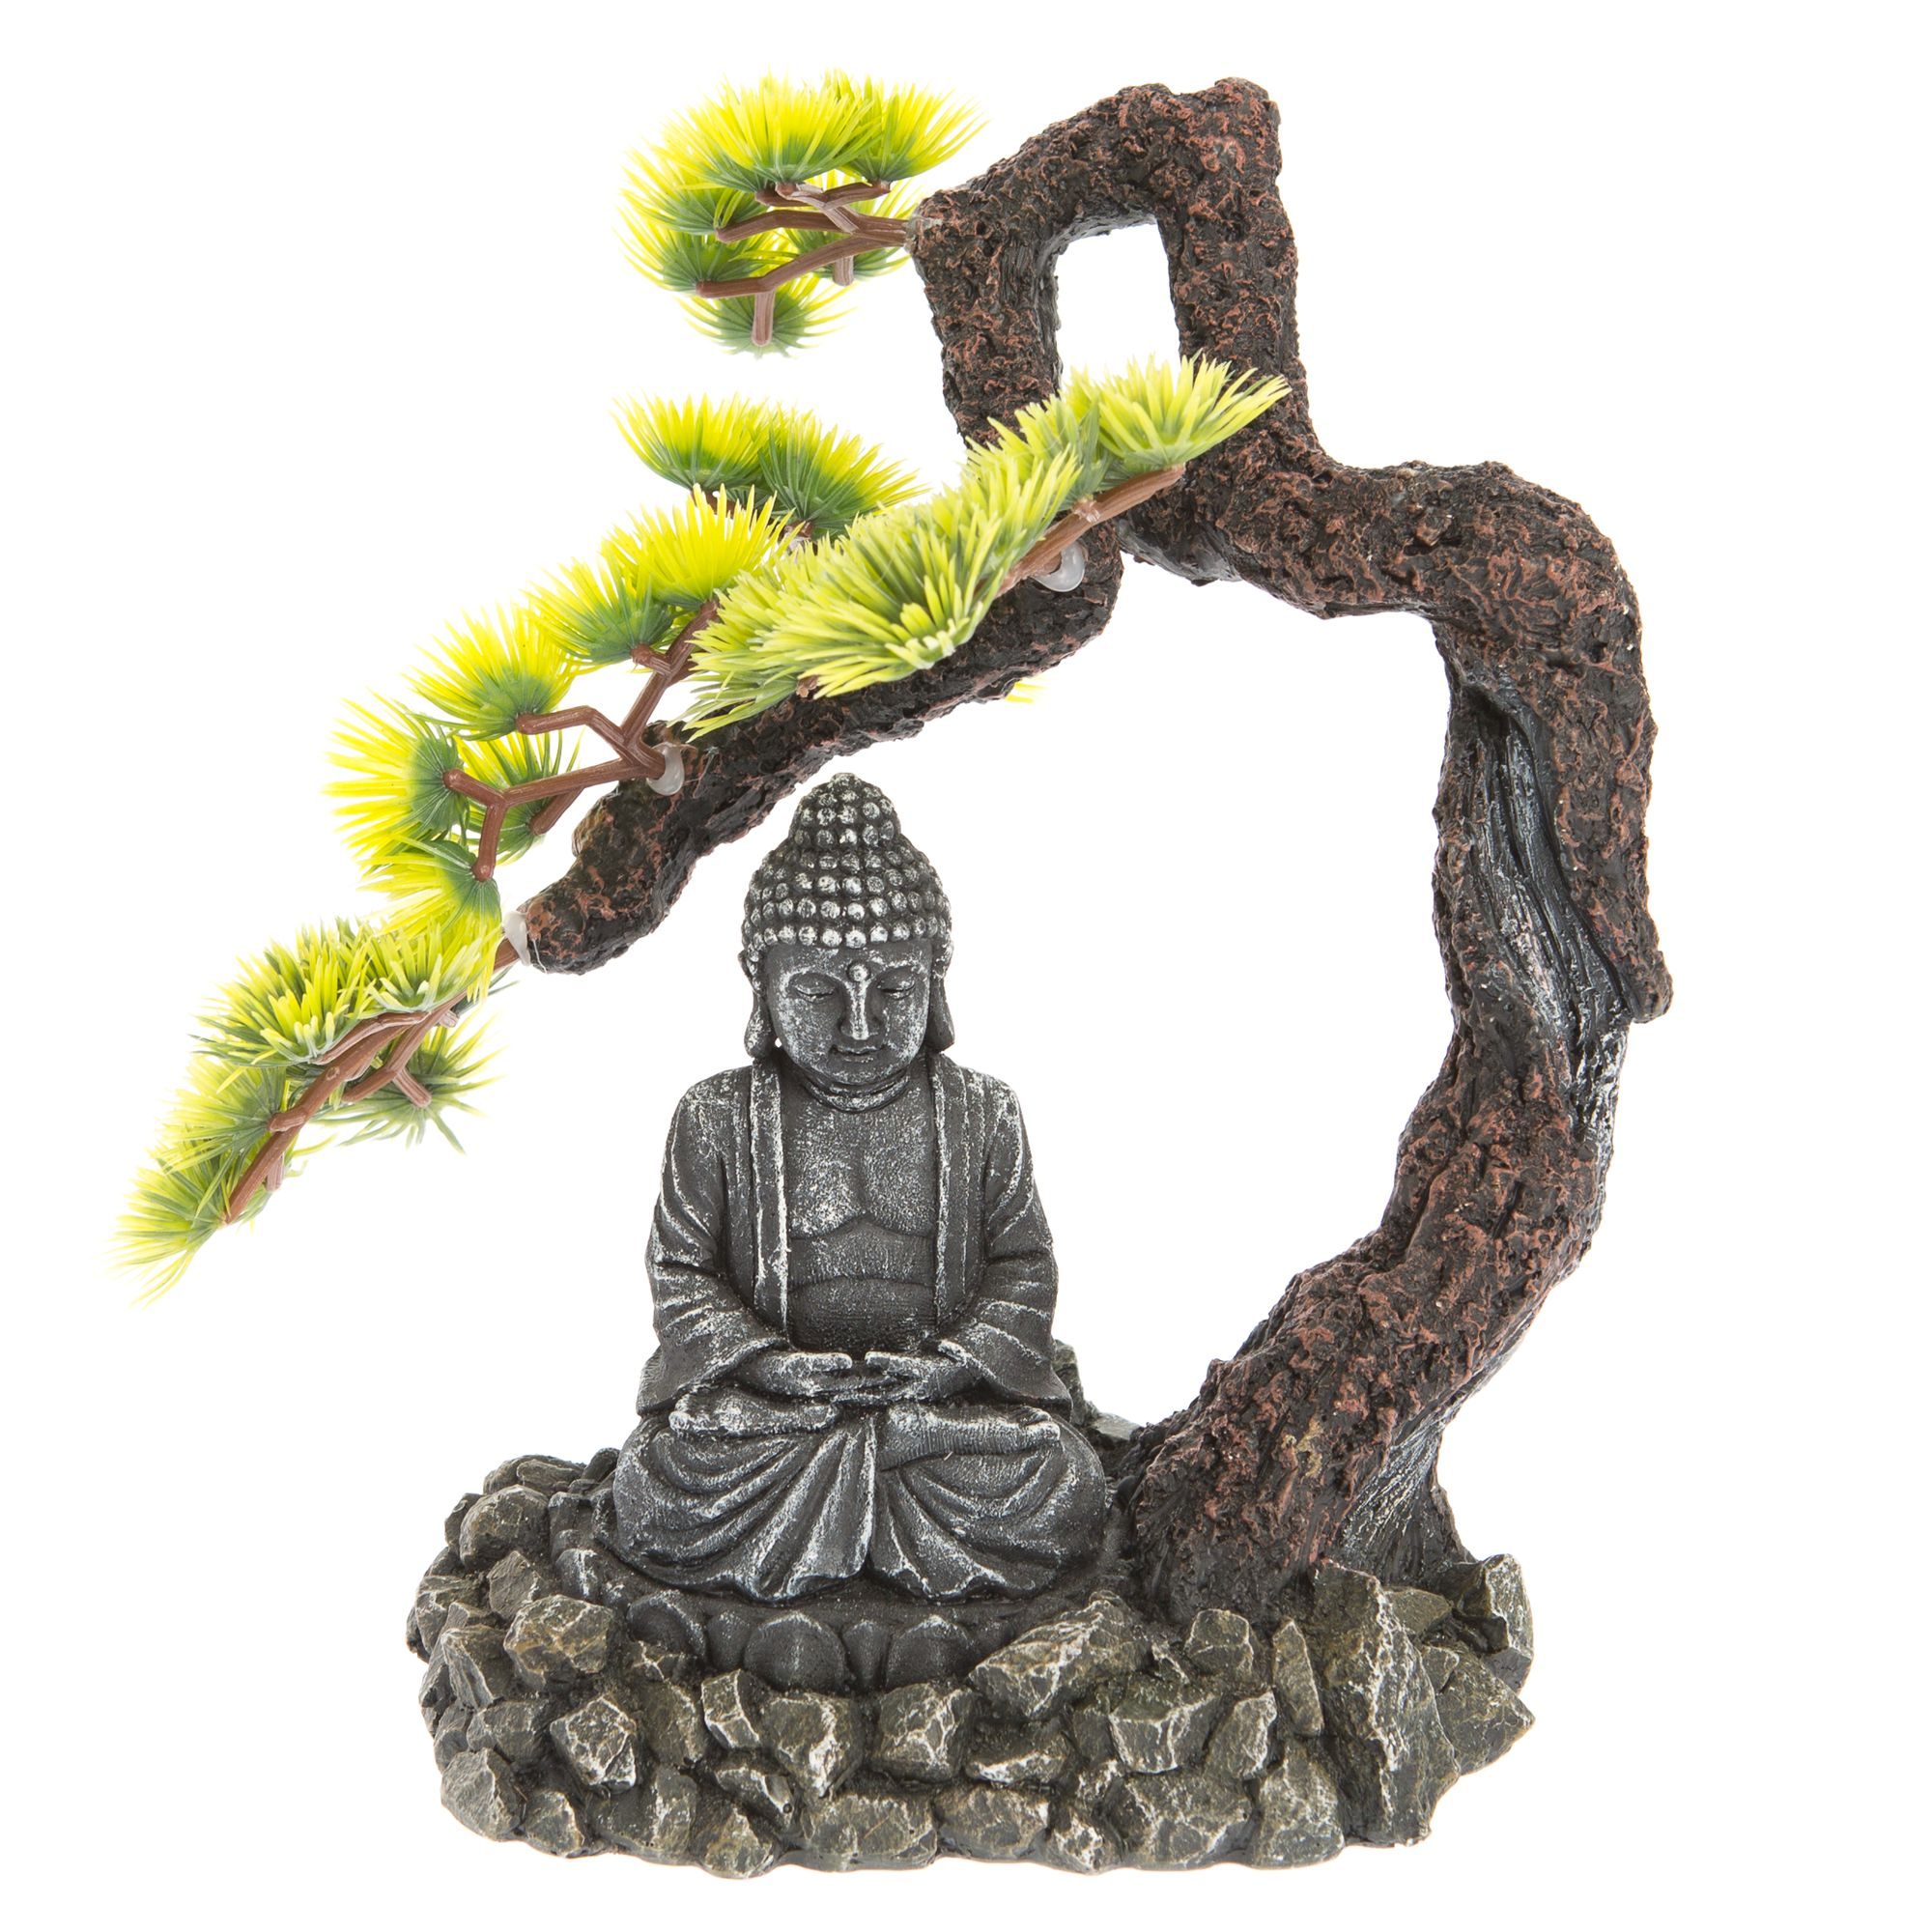 Top Fin Bonsai Tree With Buddha Aquarium Ornament Fish Ornaments Petsmart